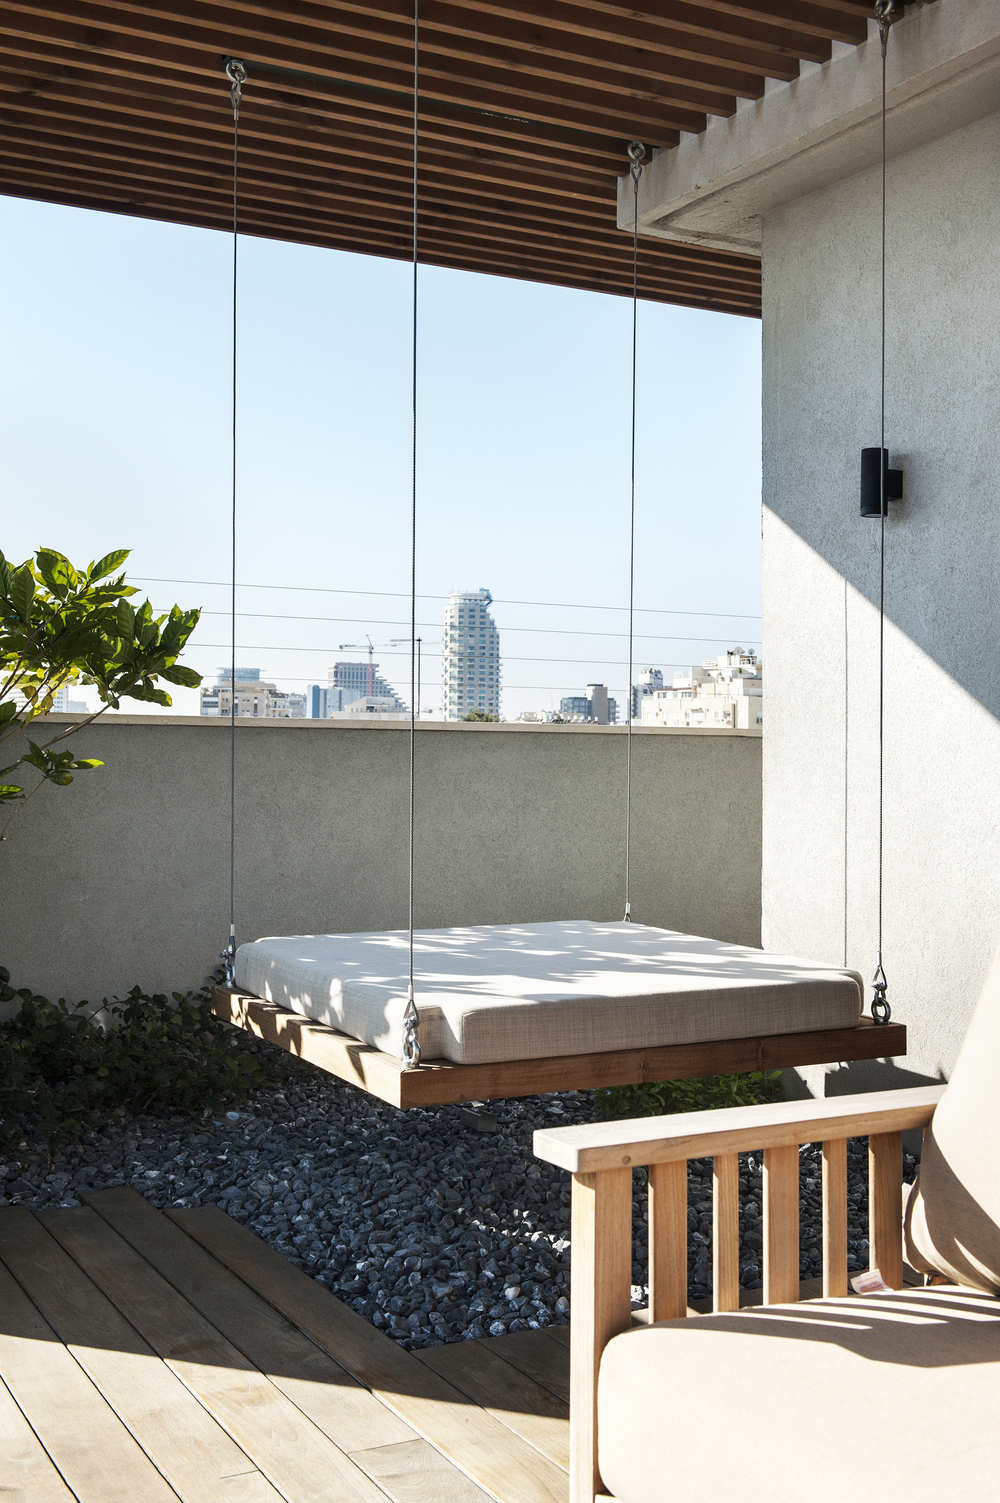 terrasse balancoire.jpg